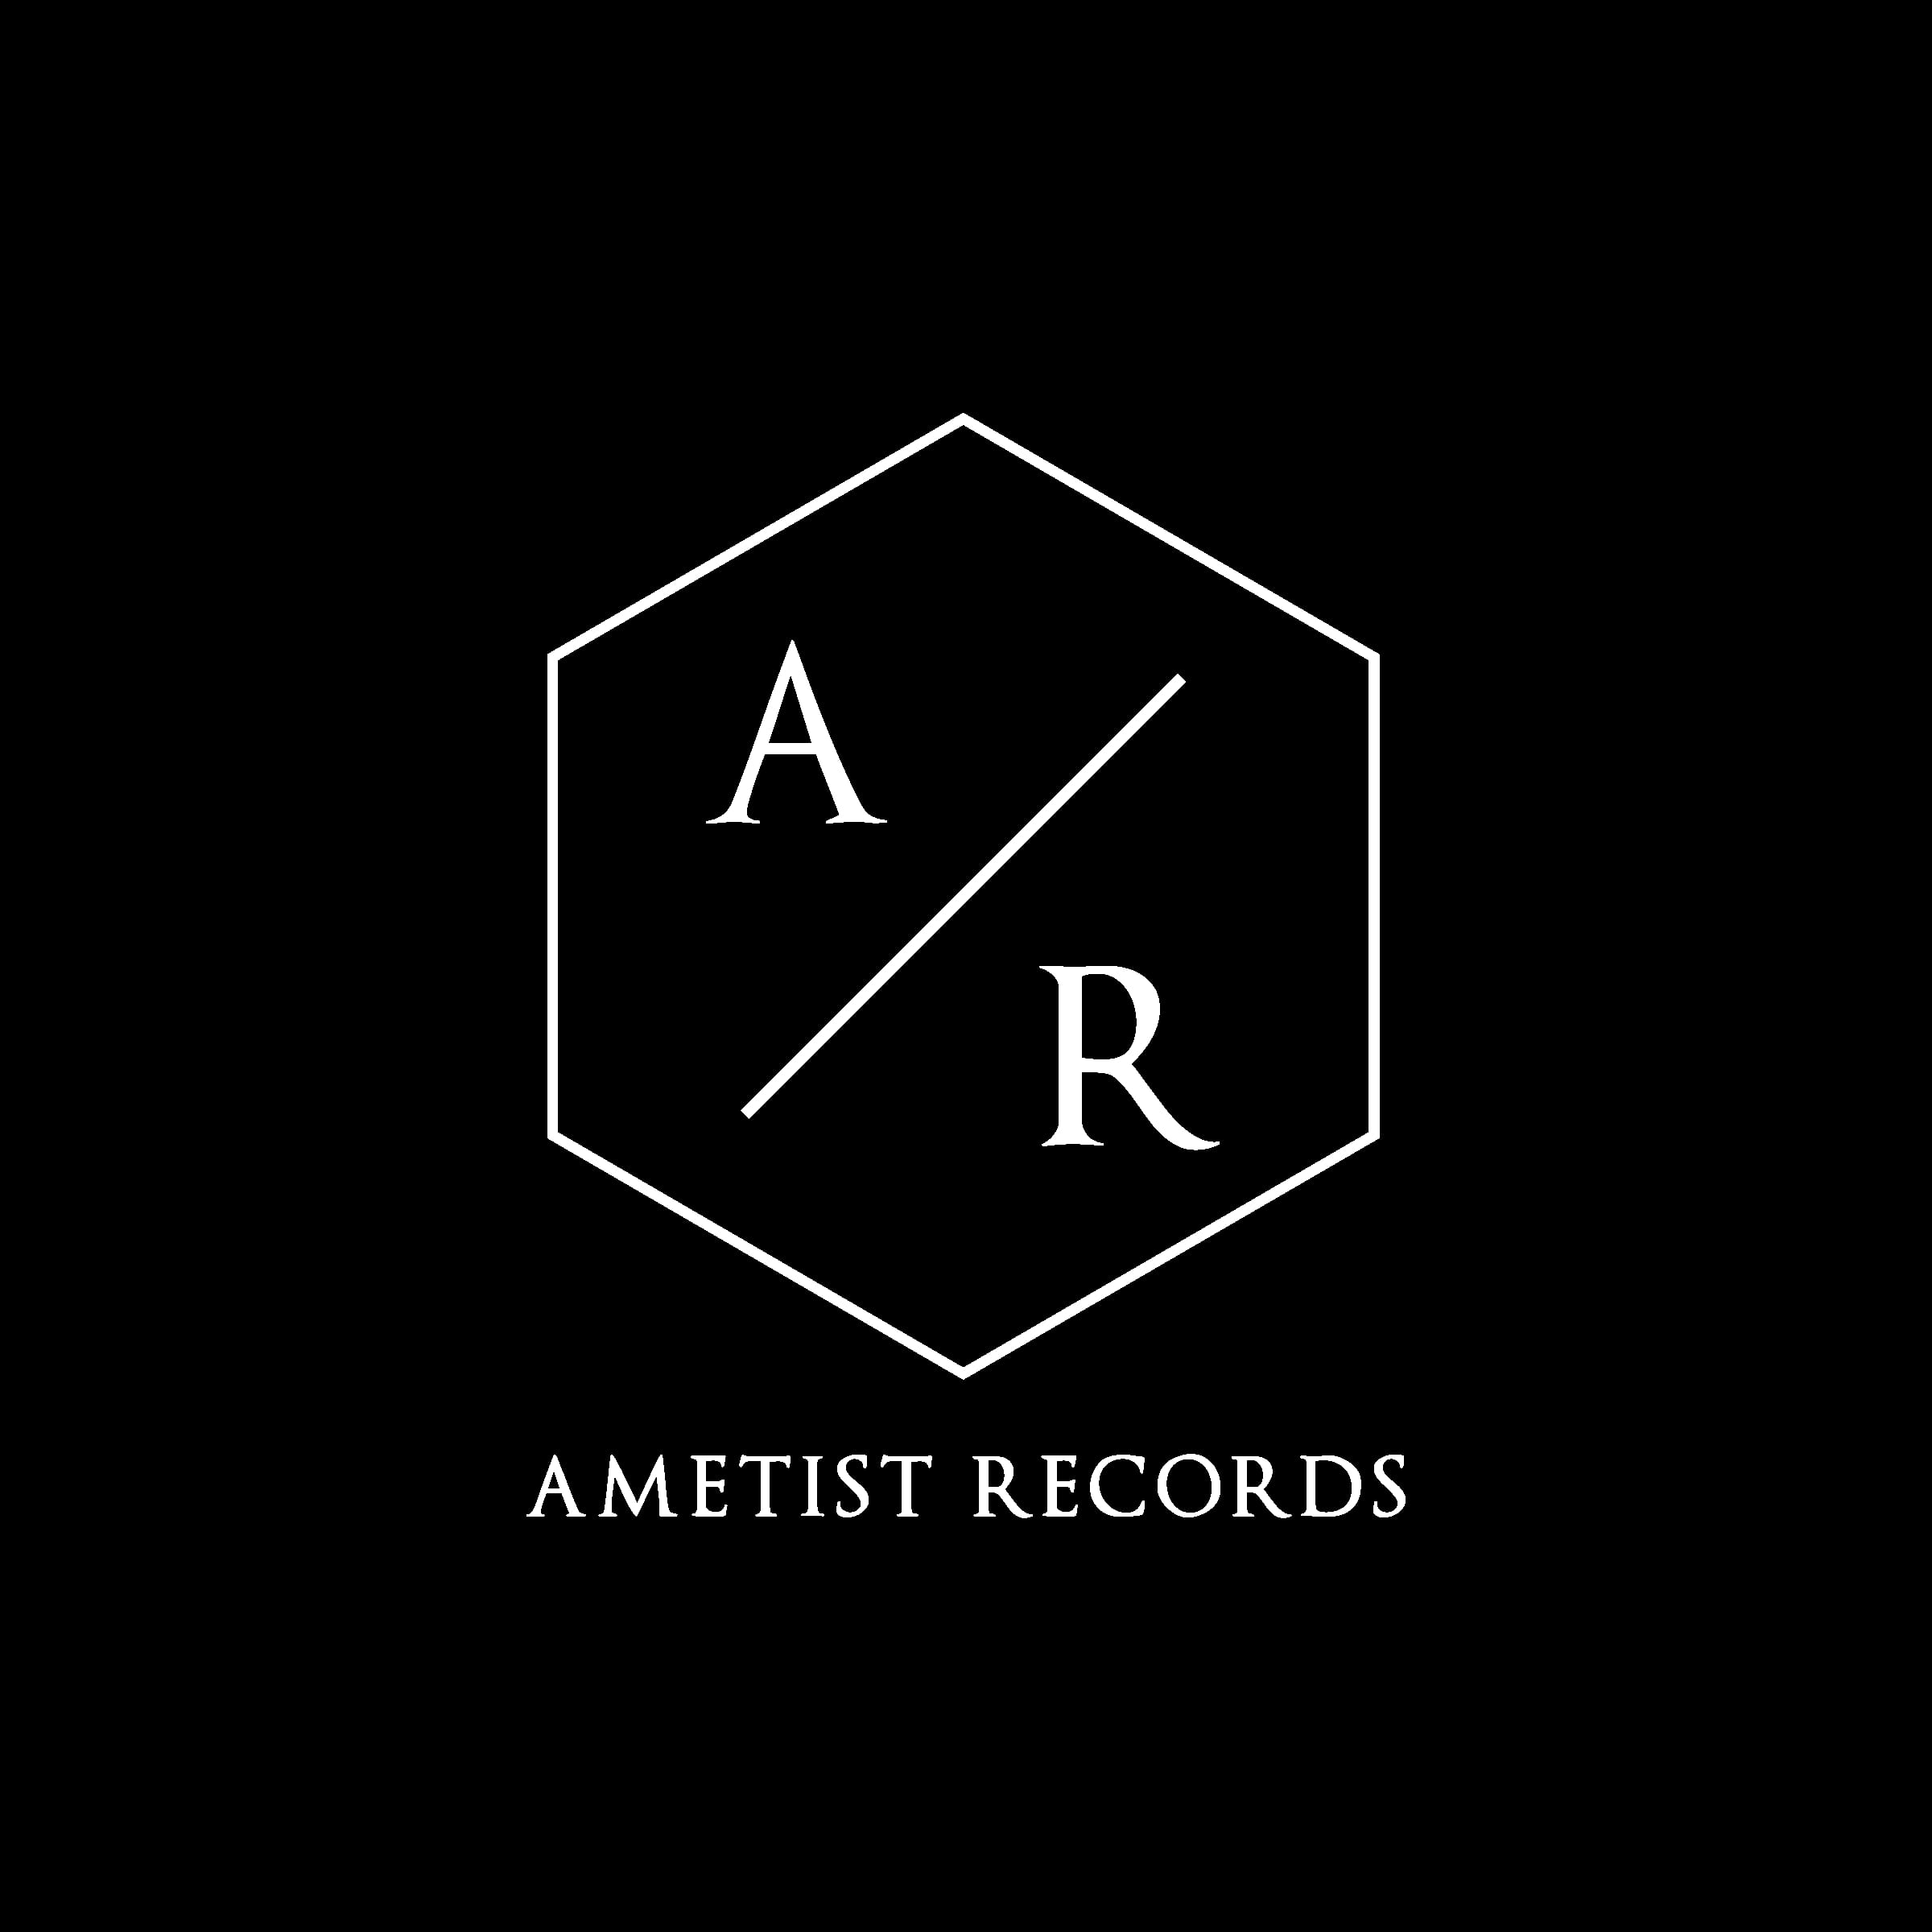 ametist_logo_2400x2400.jpg